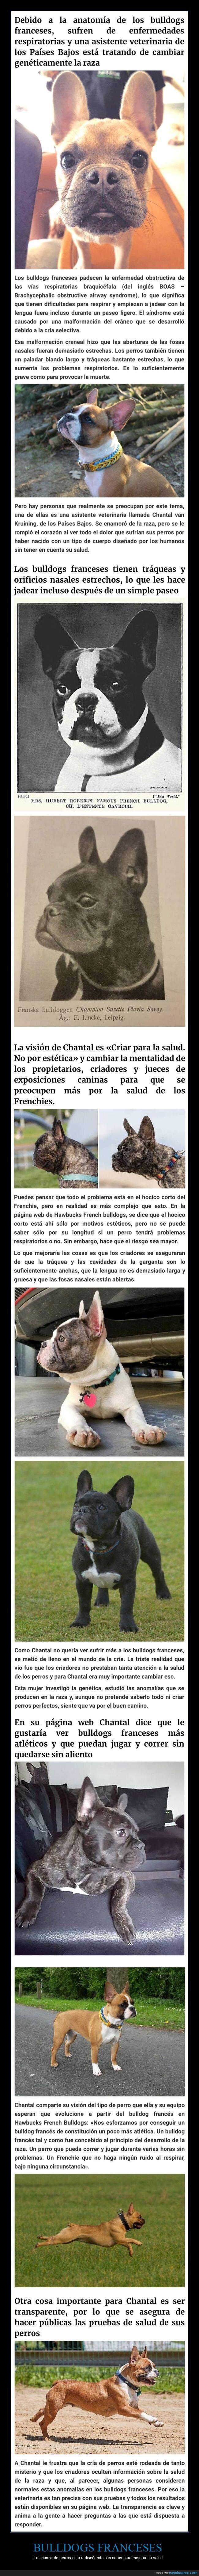 bulldog francés,cara,crianza selectiva,salud